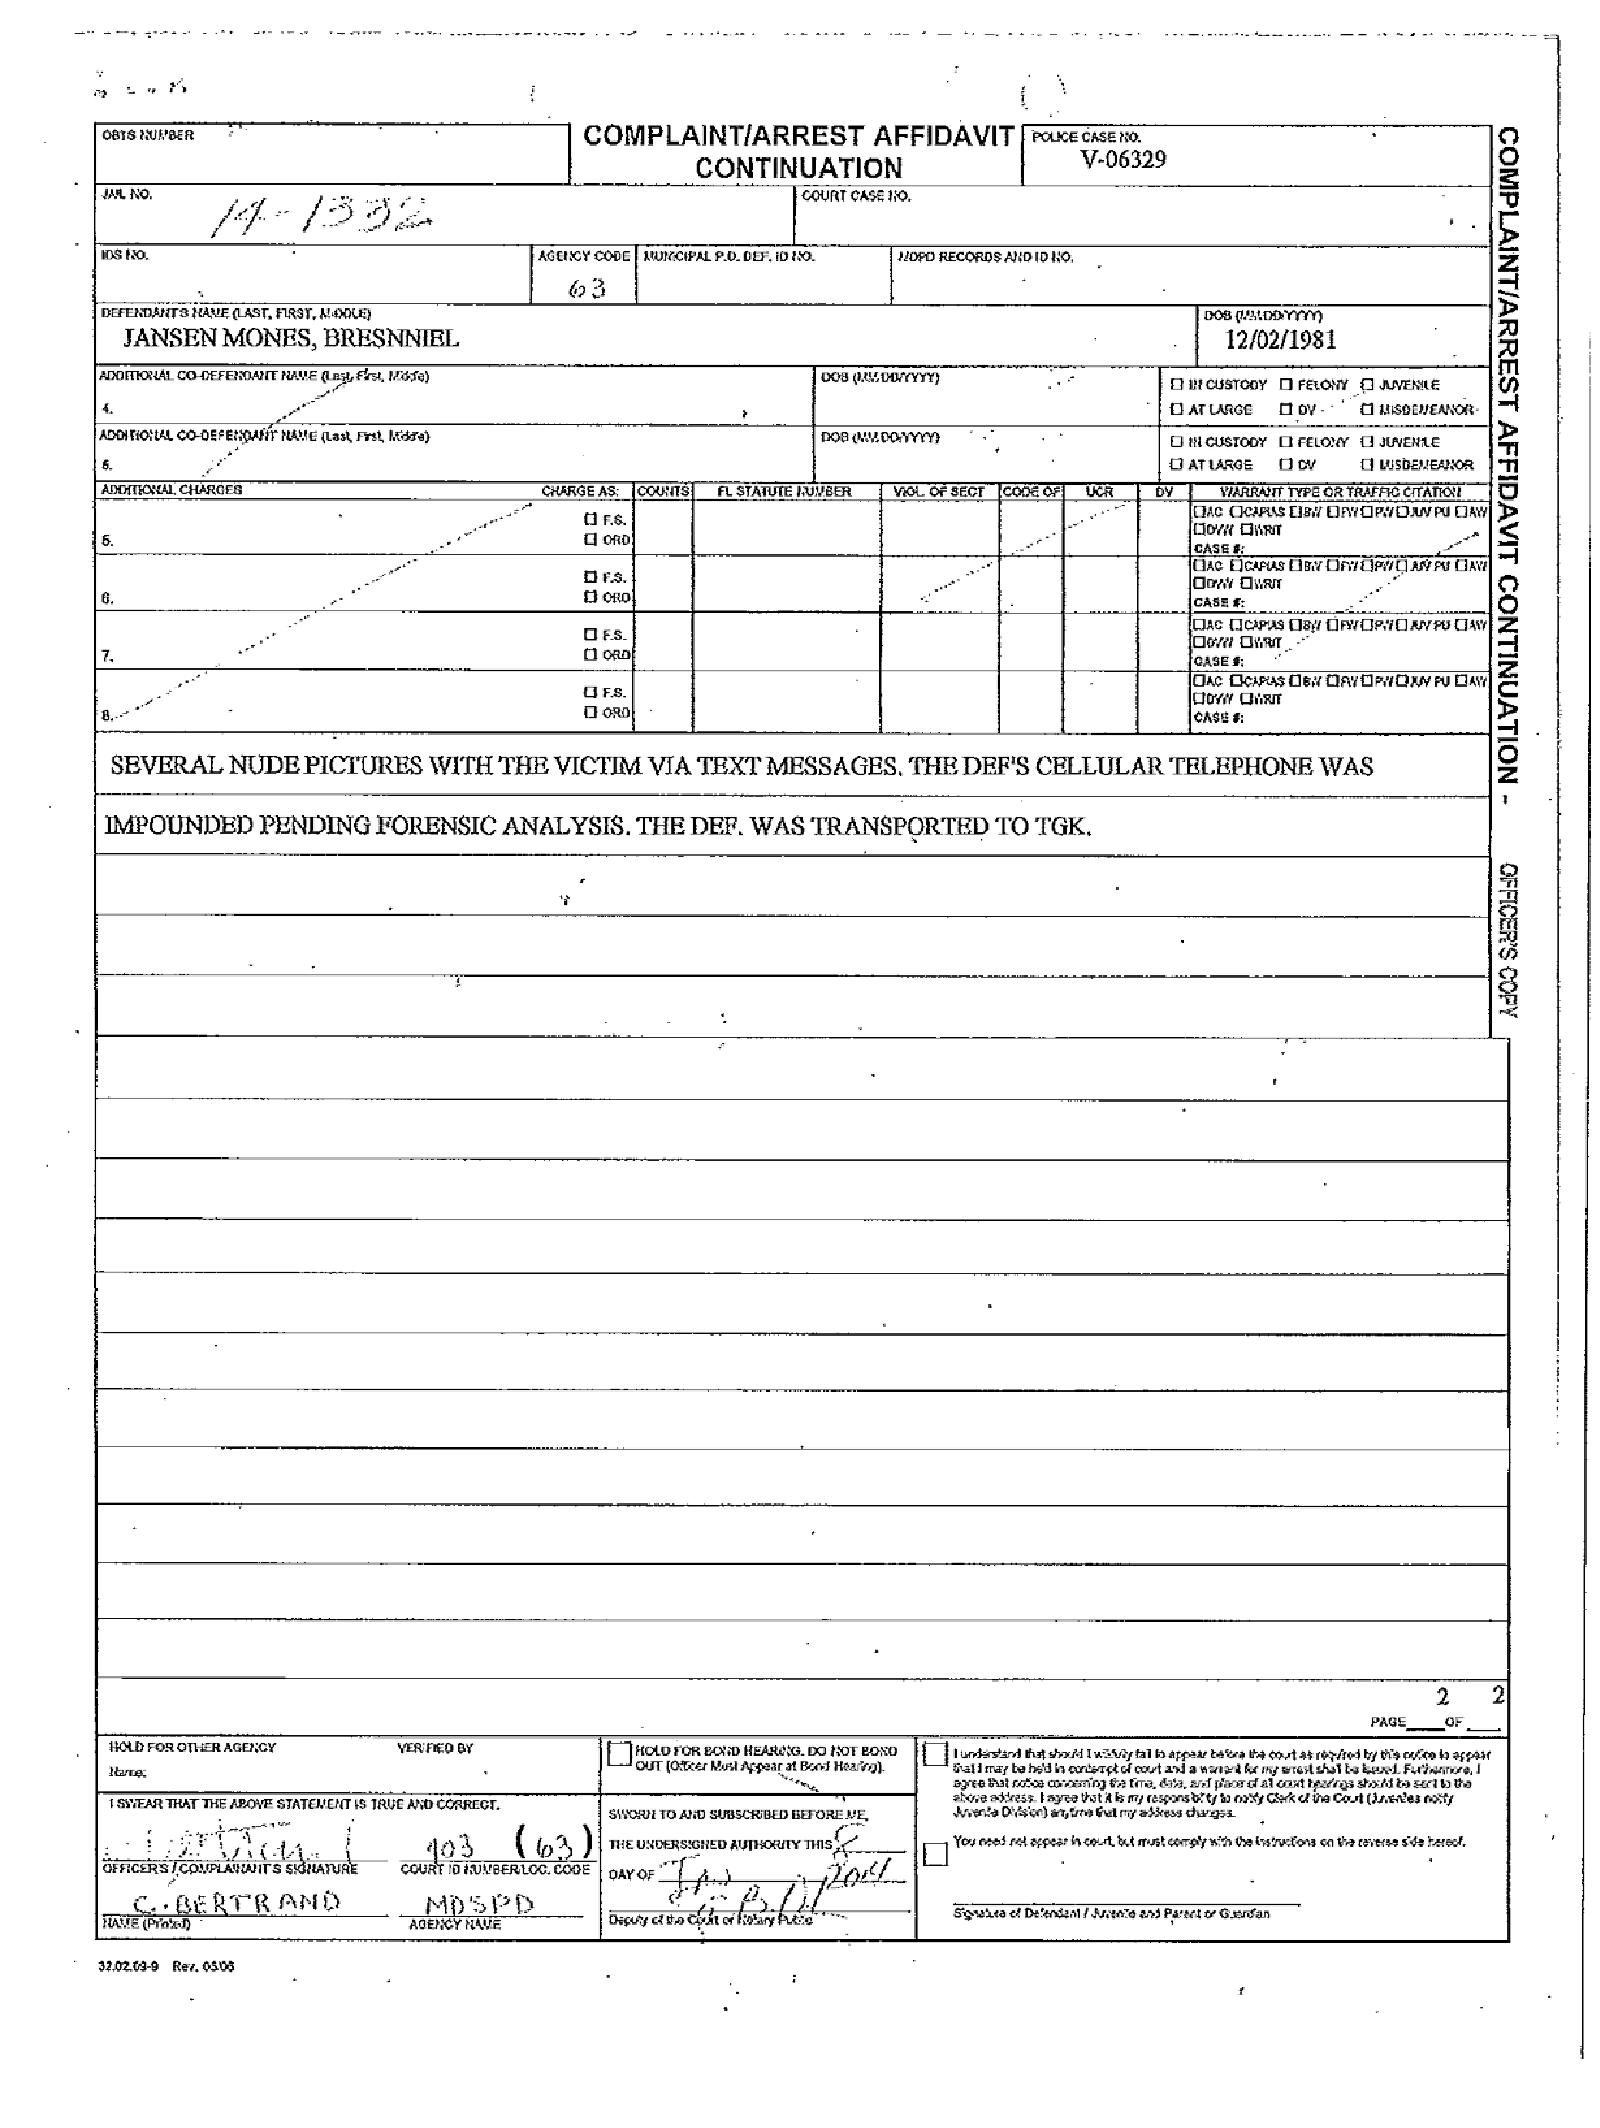 Copy of Jansen Bresnniel Police Report2.png